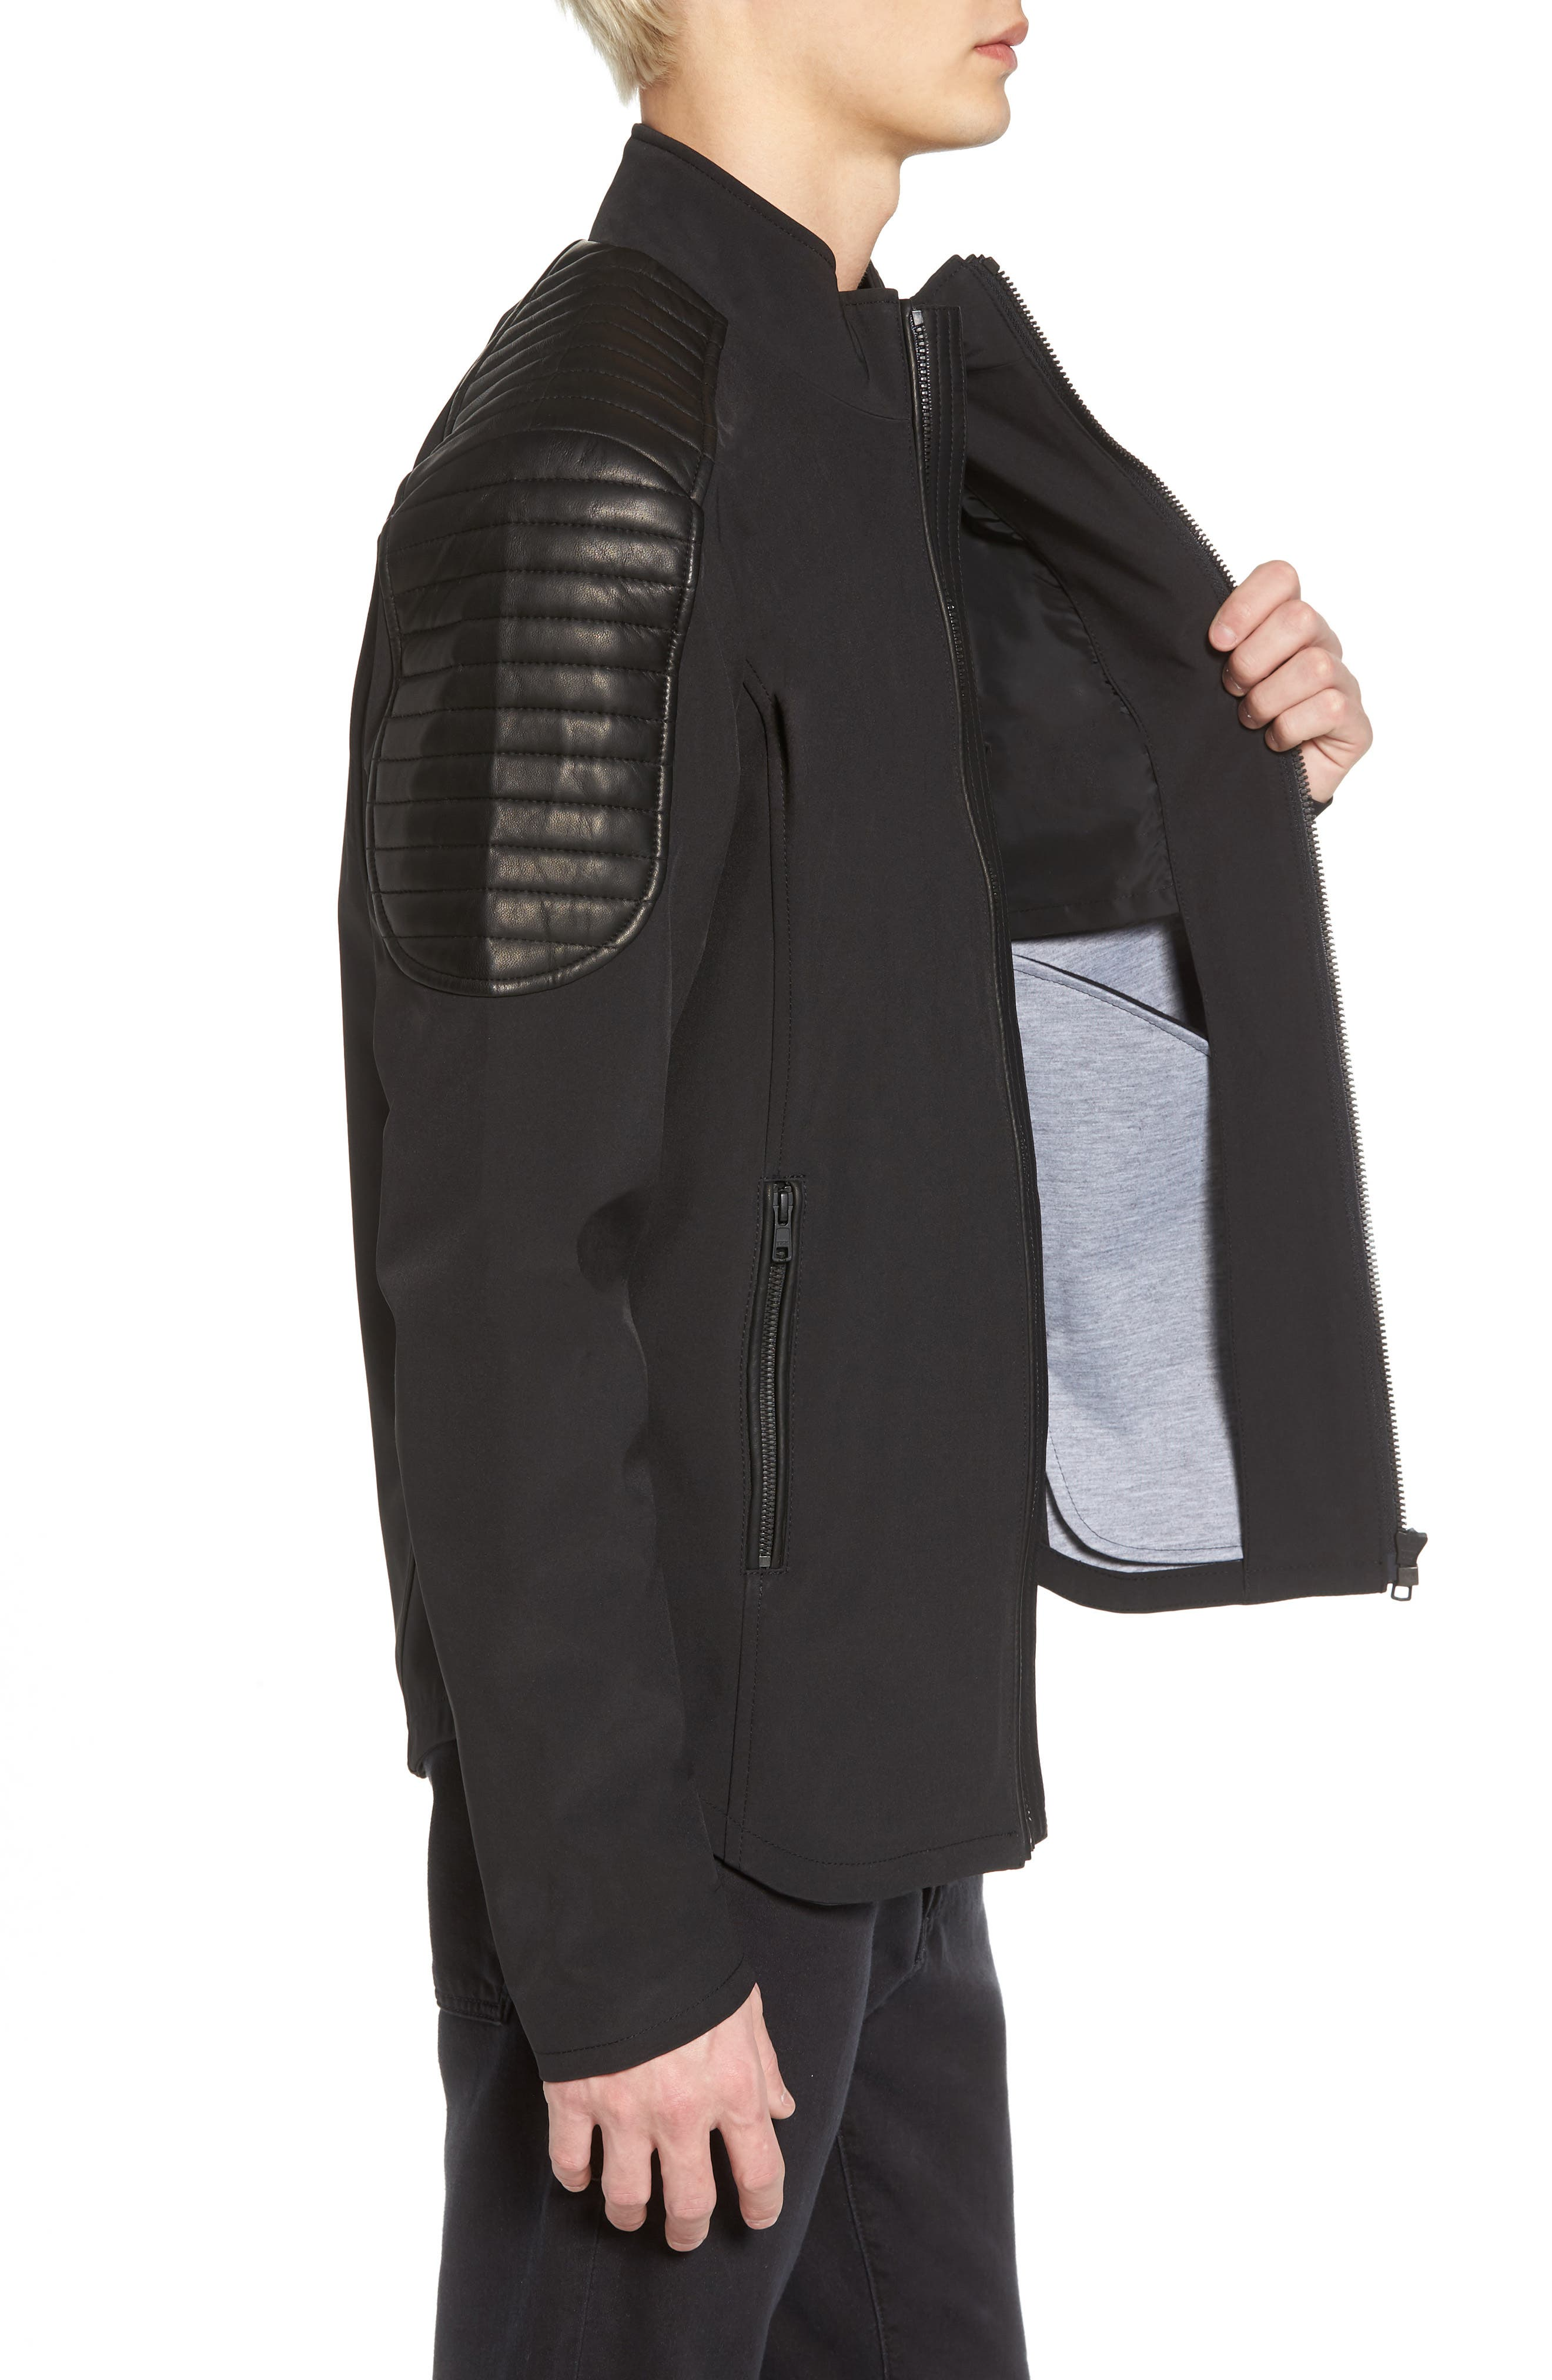 Grindstone Water Repellent Jacket,                             Alternate thumbnail 3, color,                             001